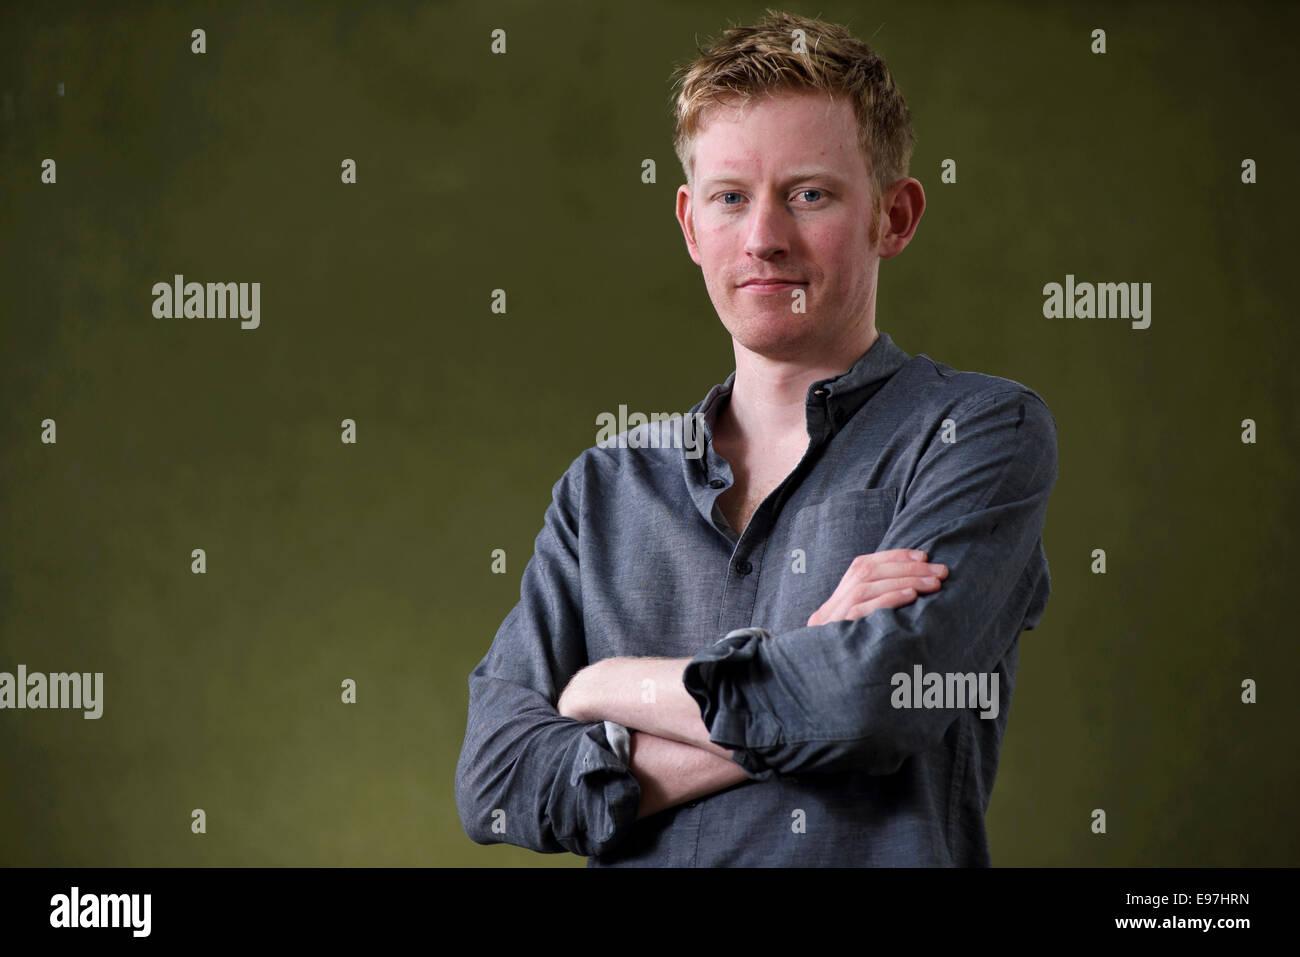 Writer Colin Barrett appears at the Edinburgh International Book Festival. - Stock Image